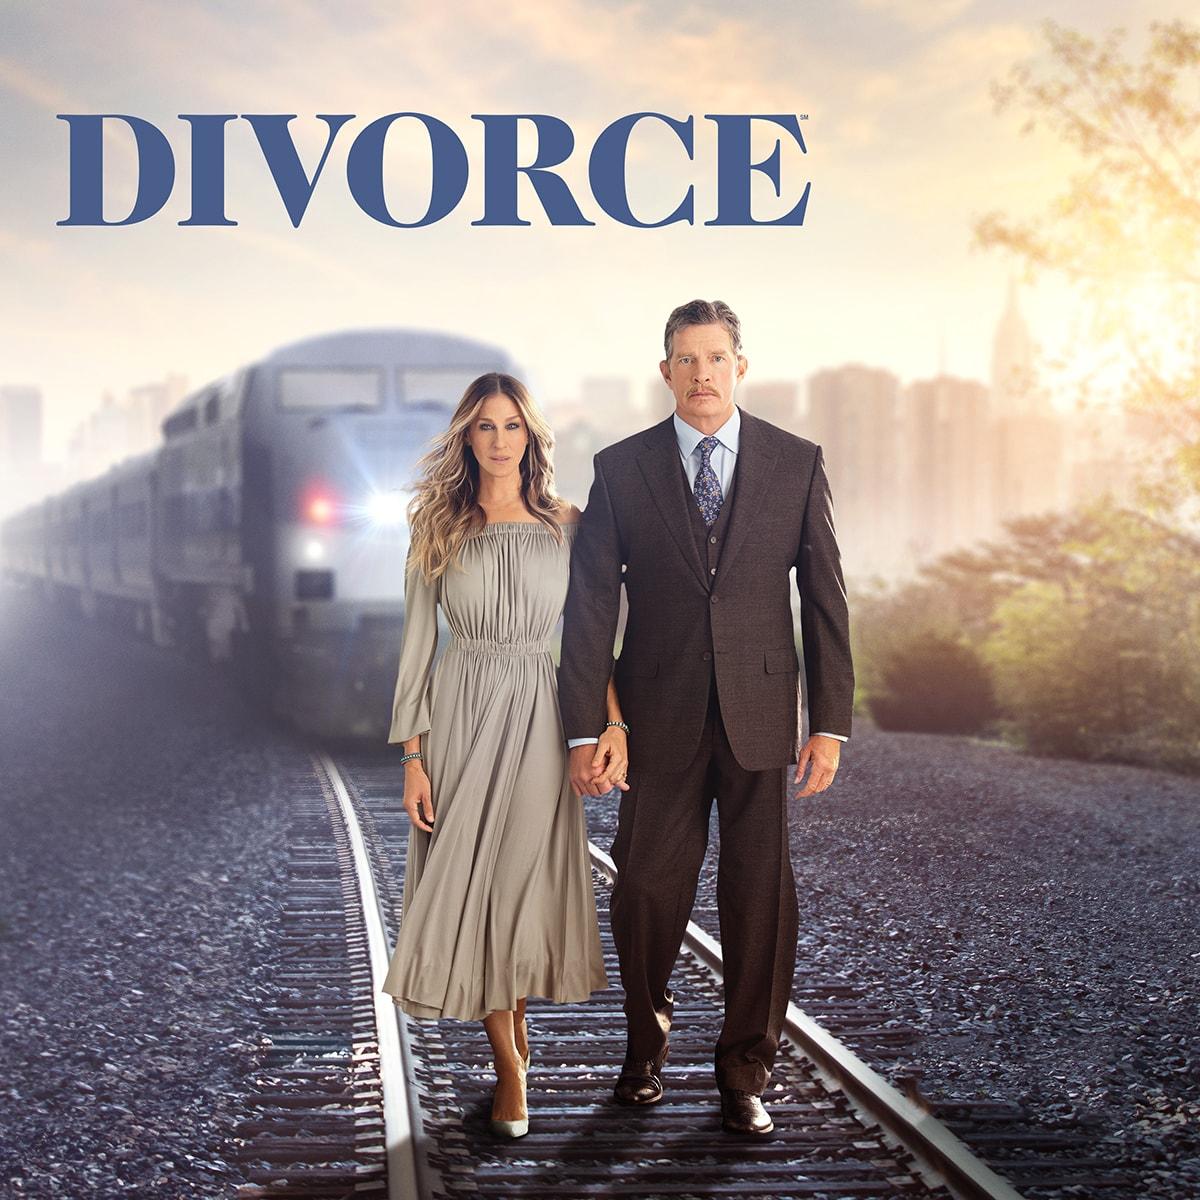 Serie Divorce